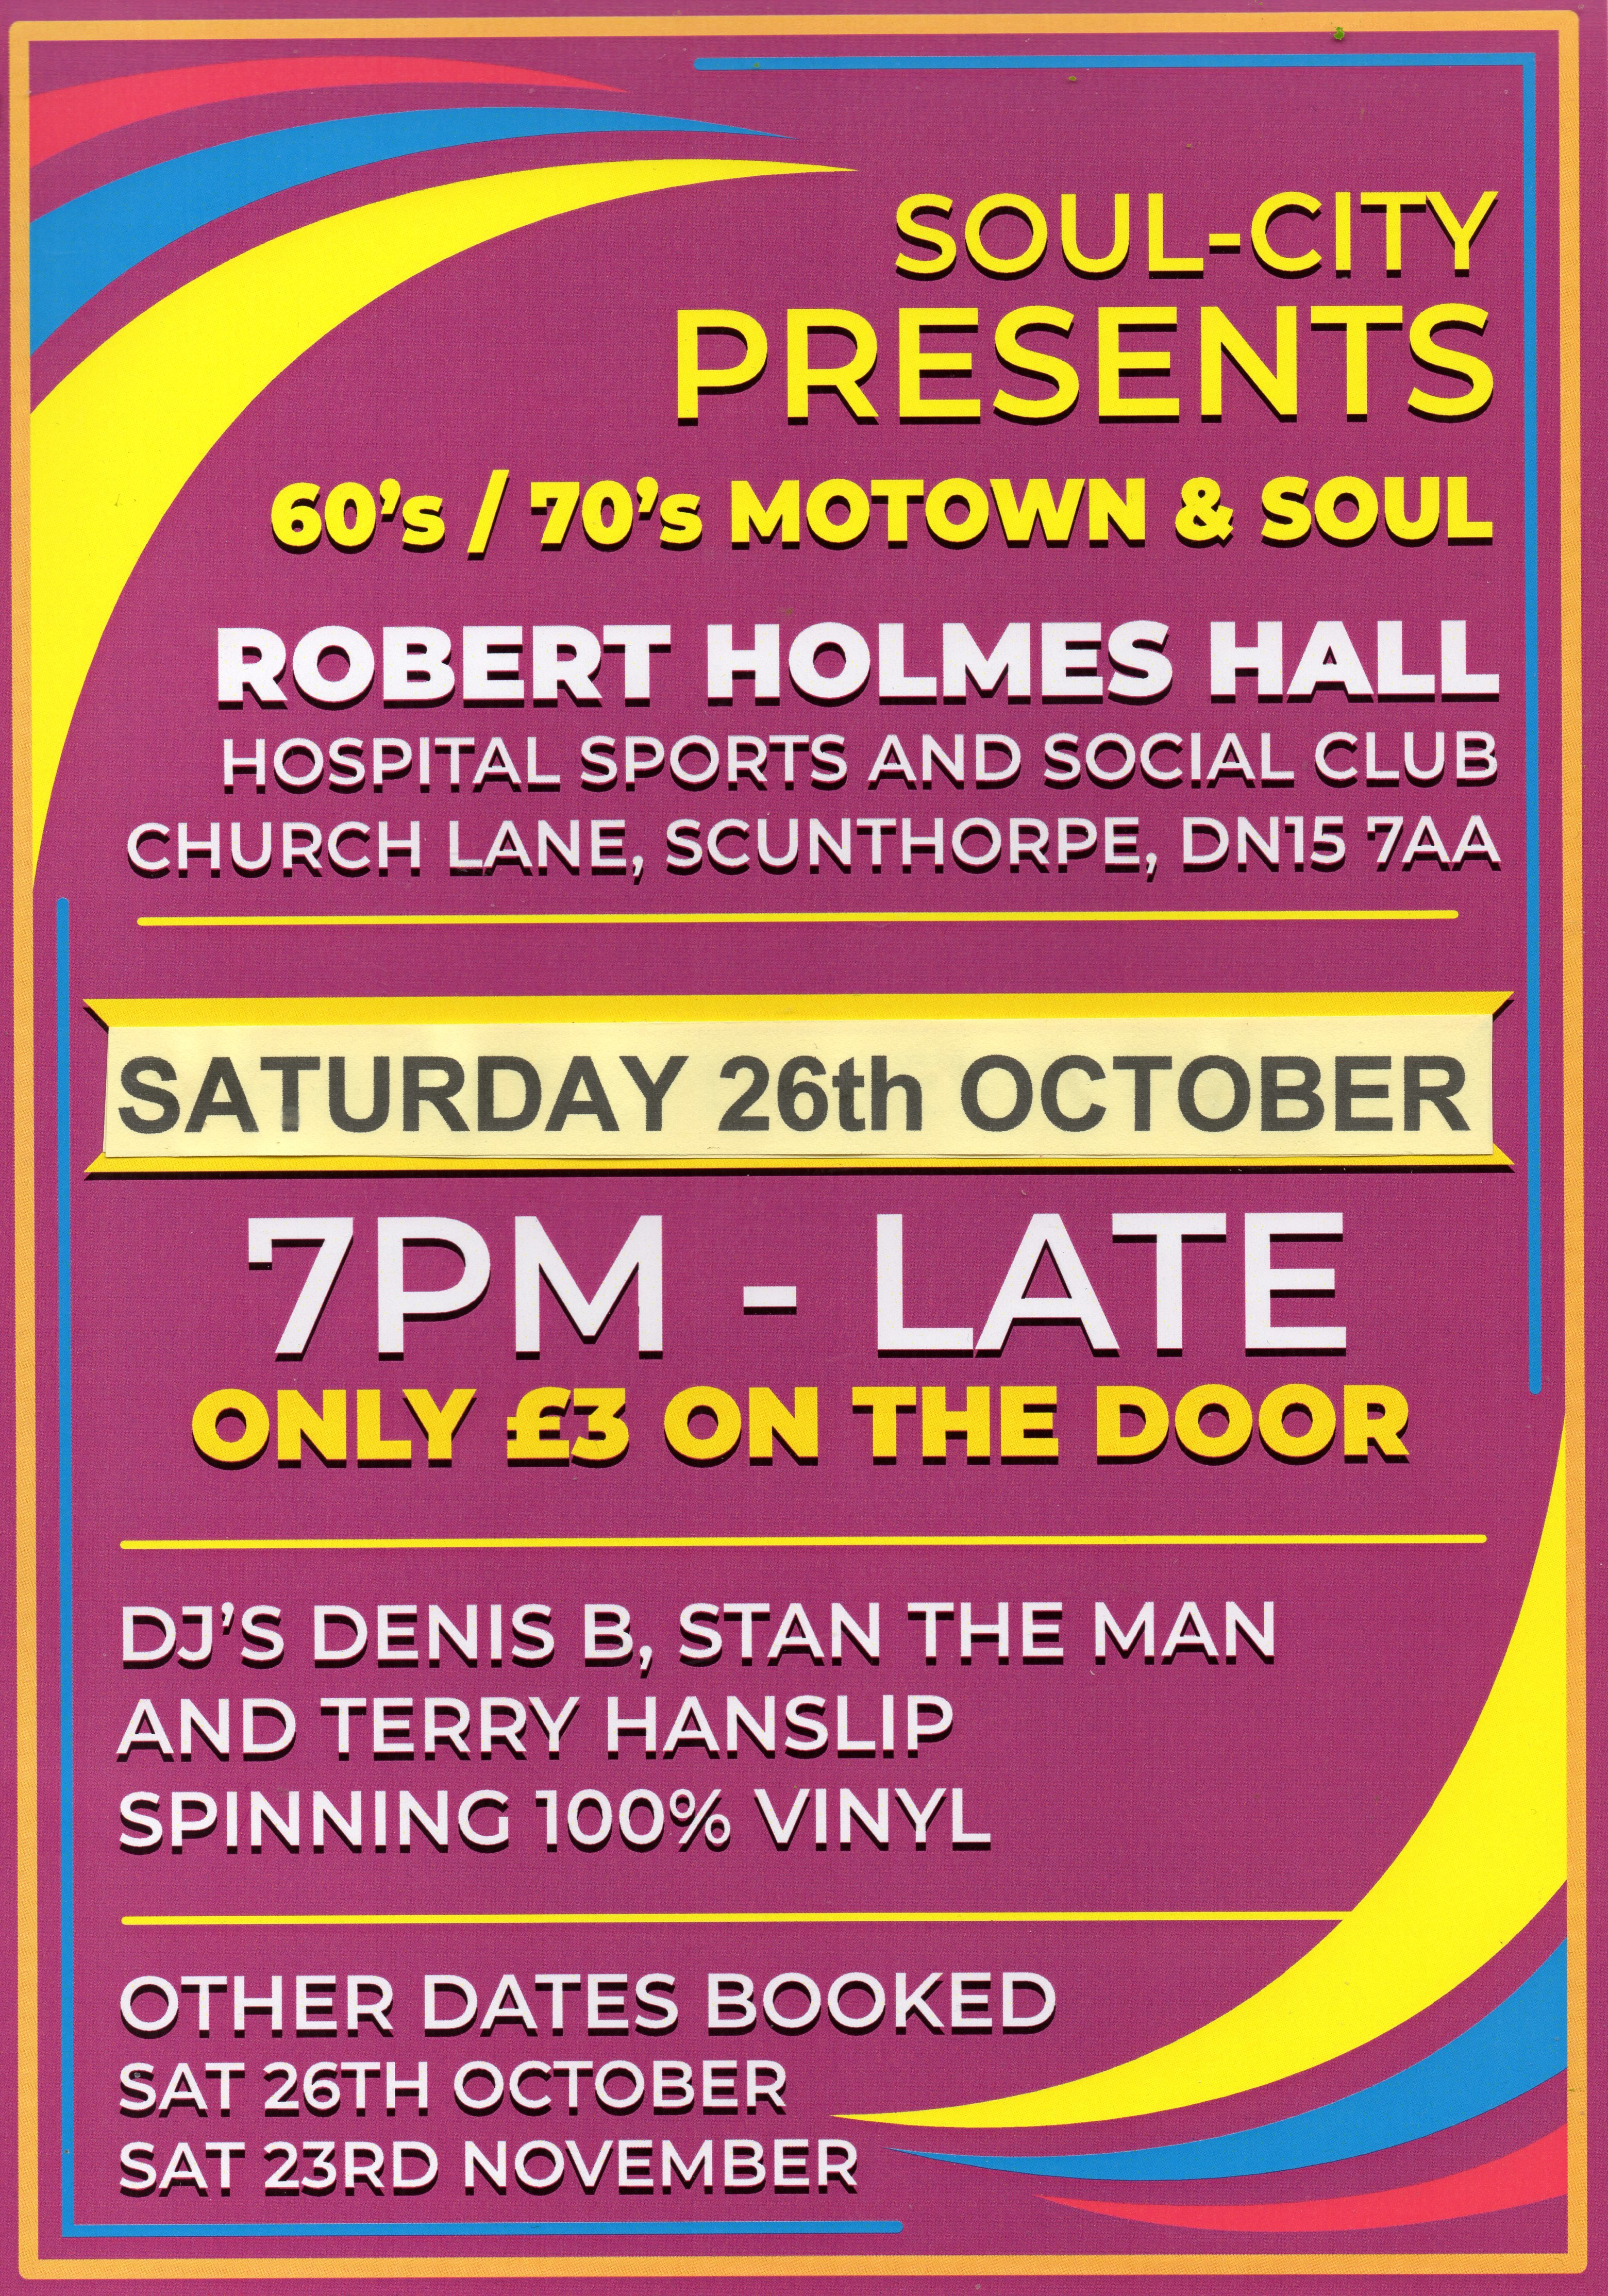 Scunthorpe Robert Holmes Hall At Scunthorpe Hospital flyer